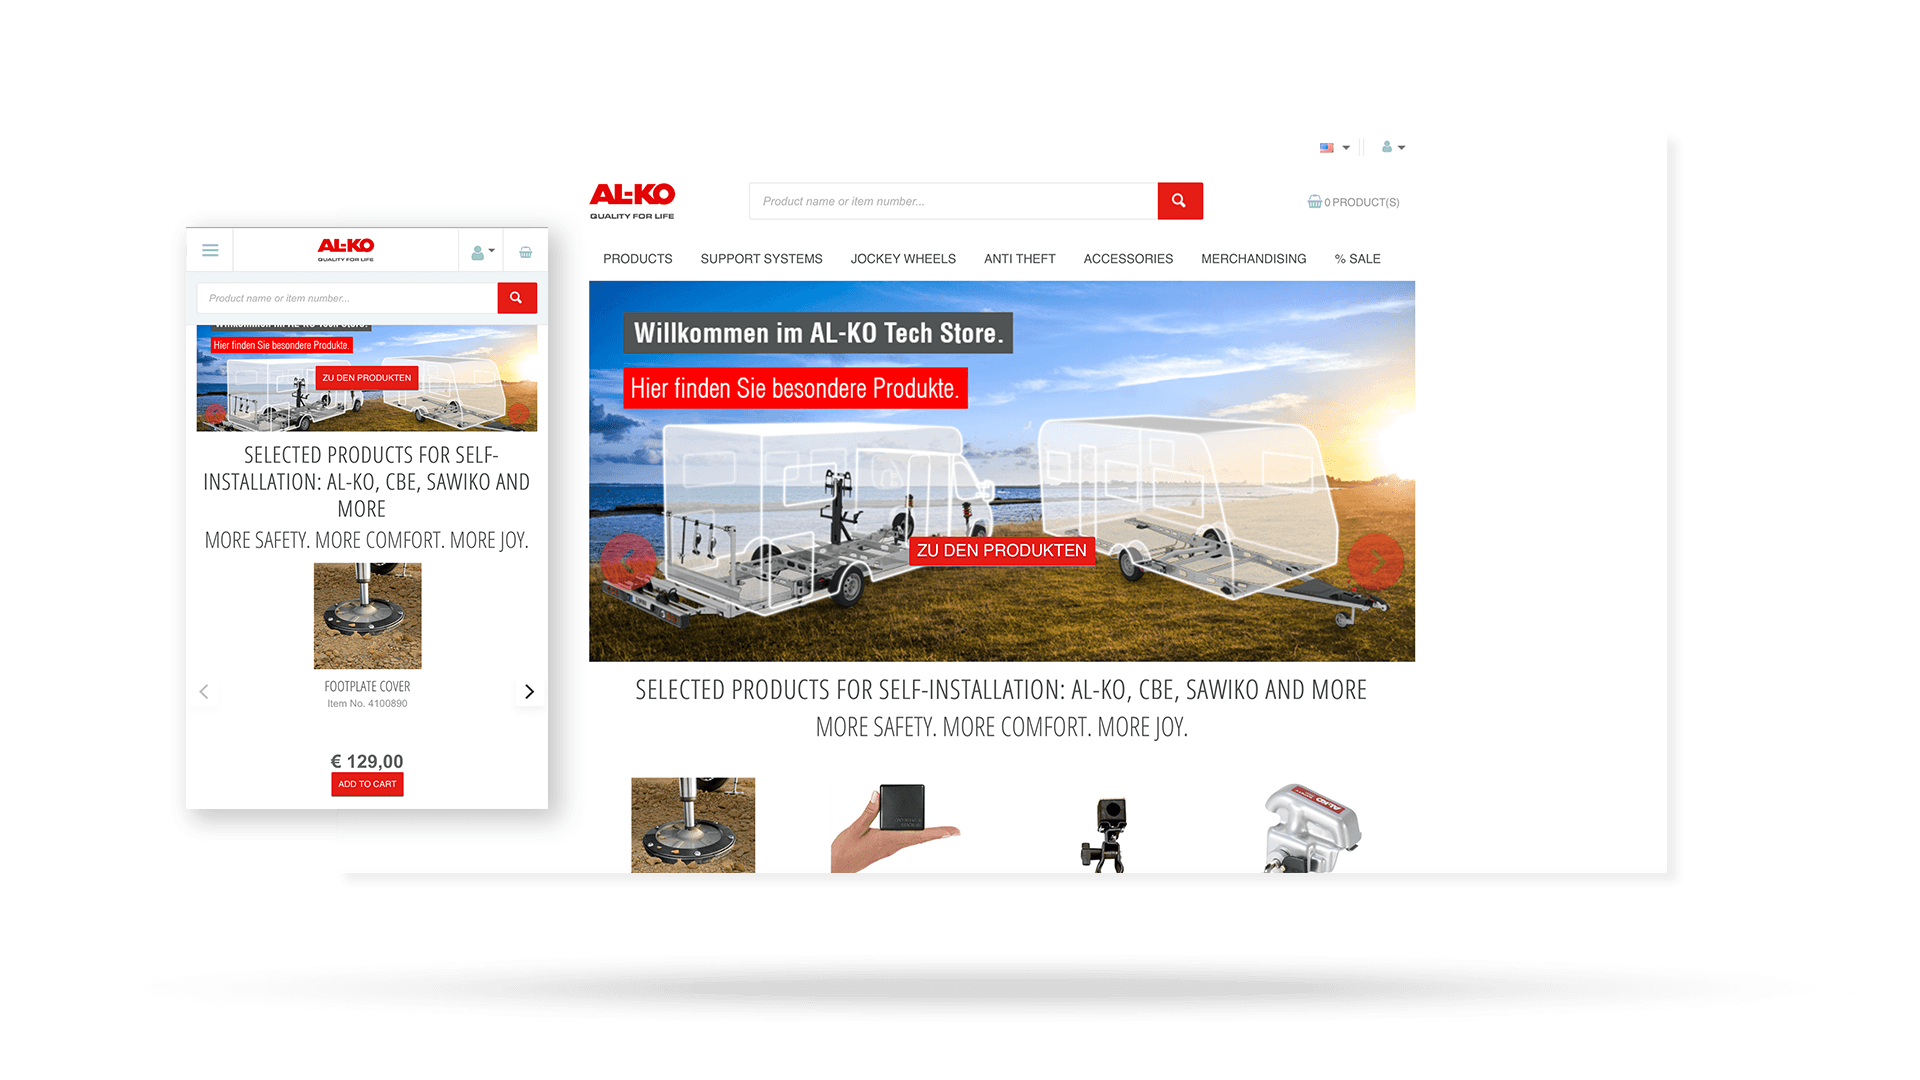 AL-KO B2B Webshop